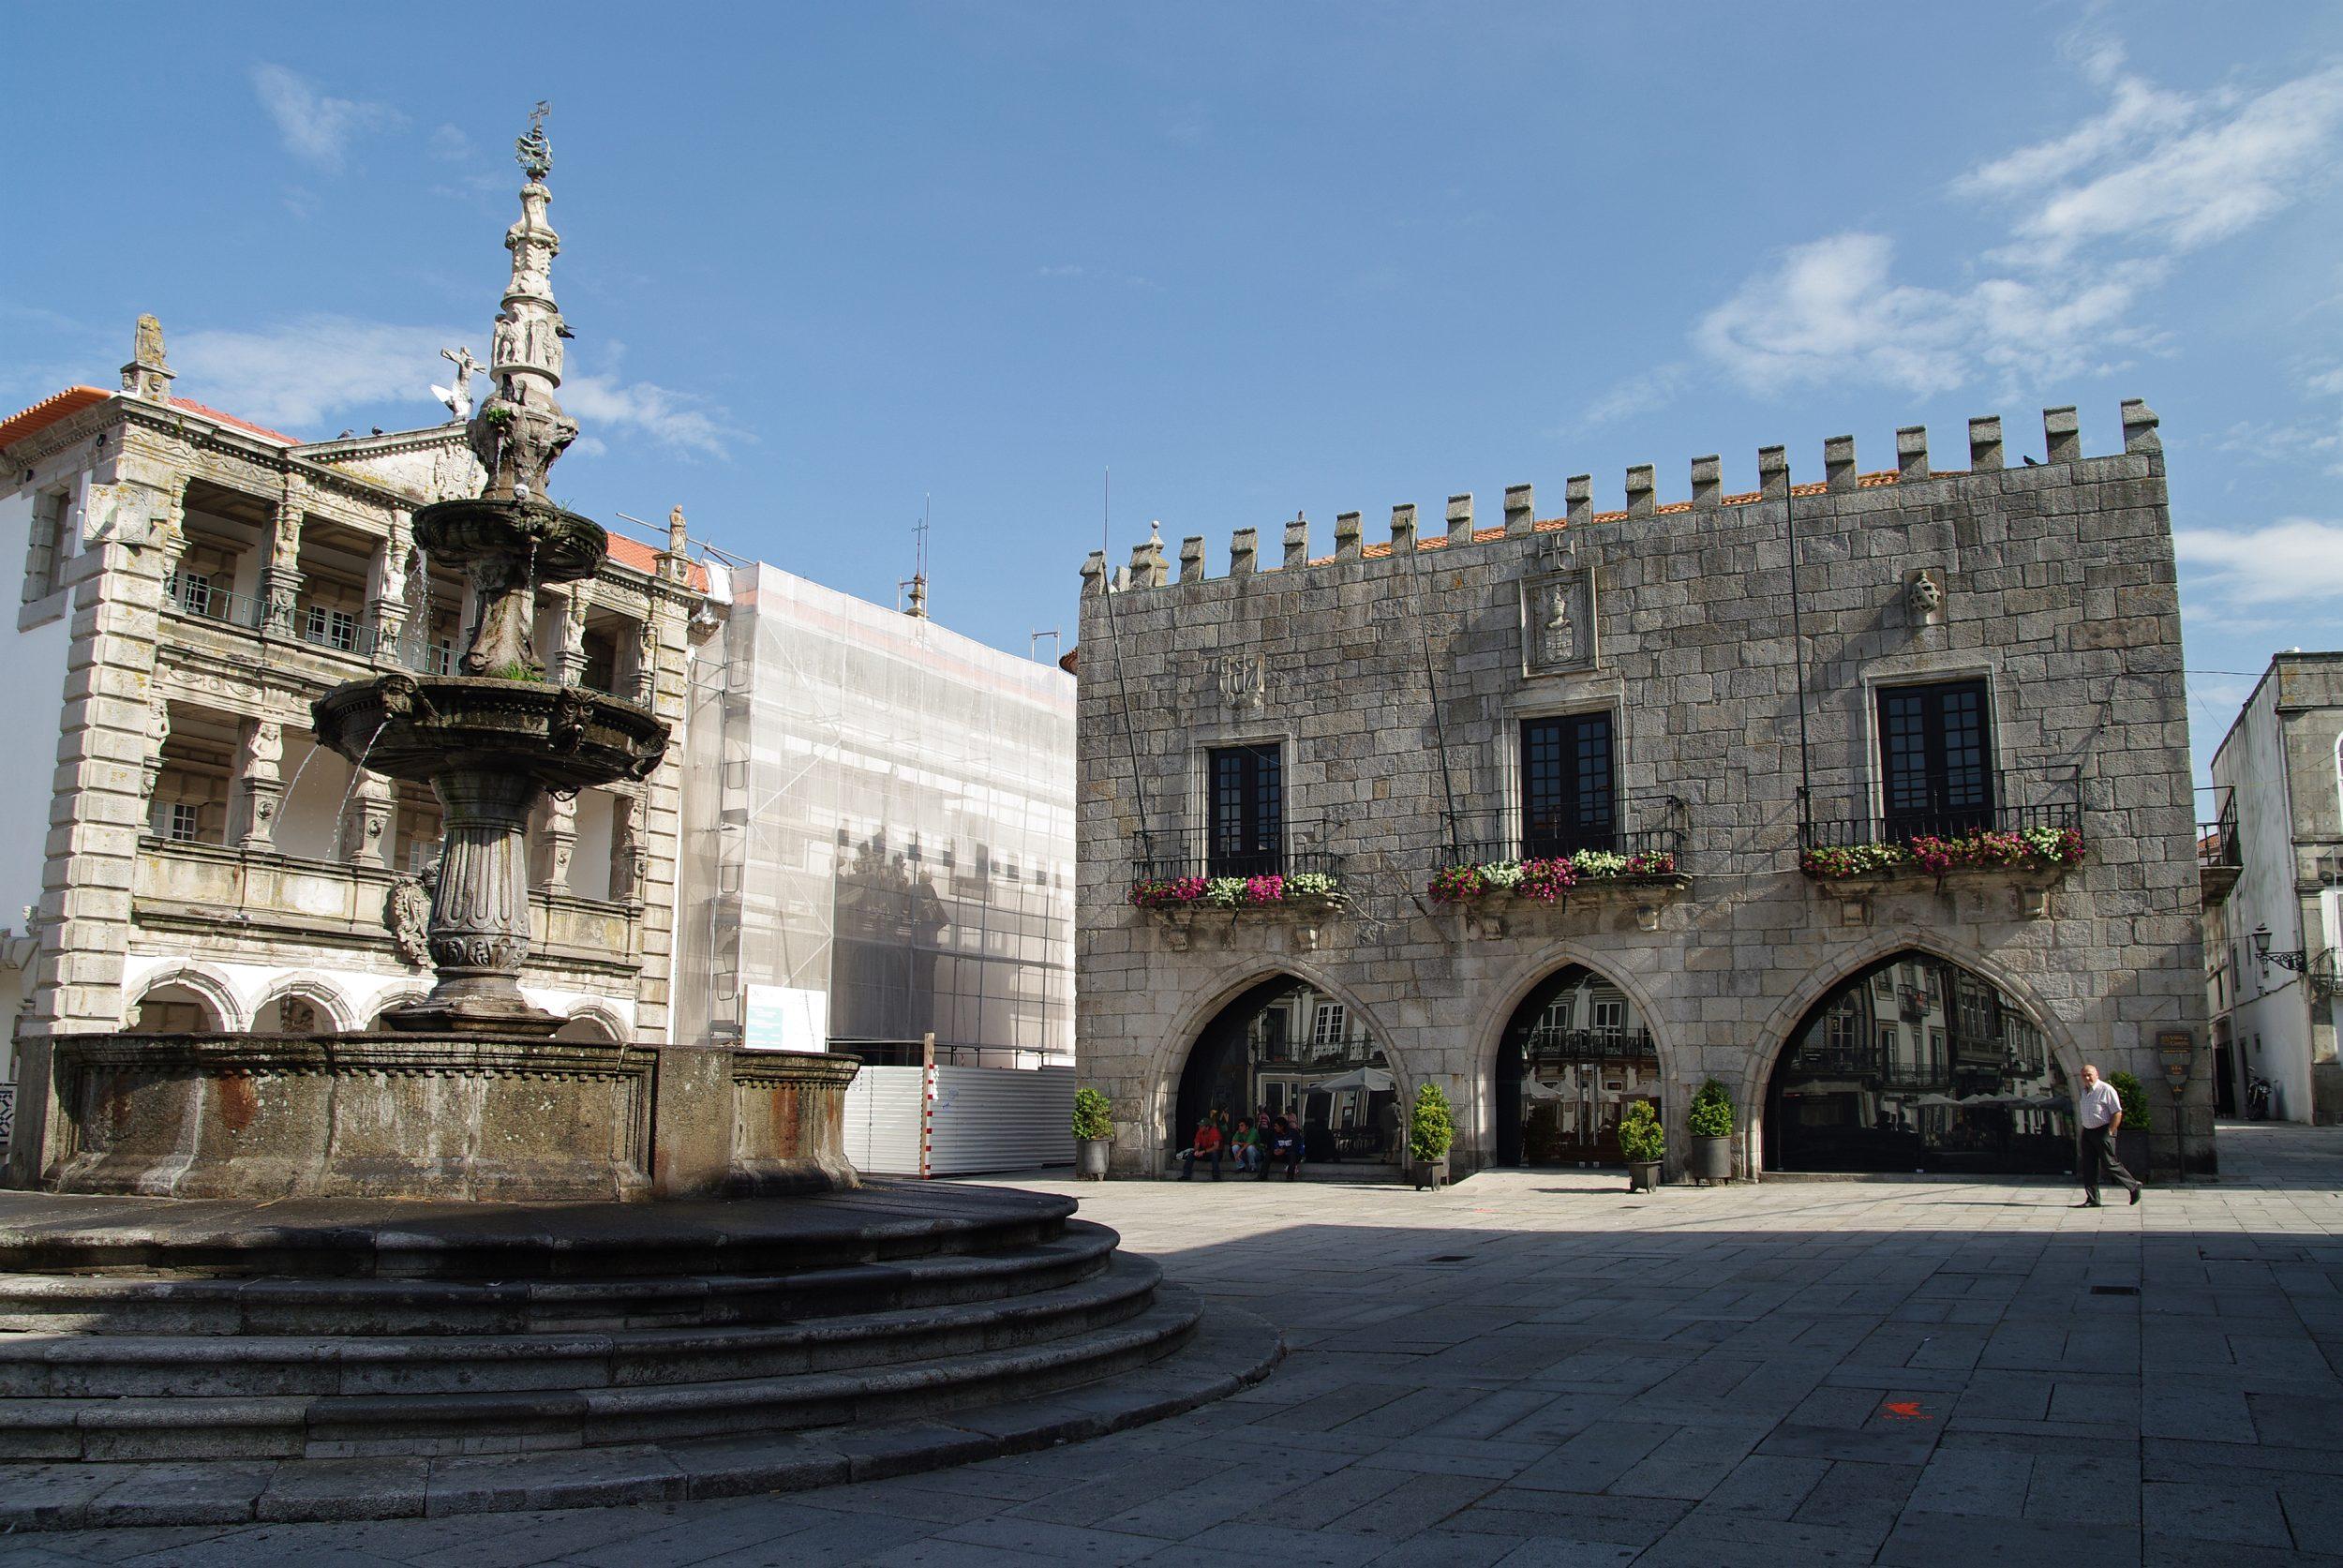 Http Commons Wikimedia Org Wiki File Pa C3 A7os Municipais De Viana Do Castelo 1 Jpg